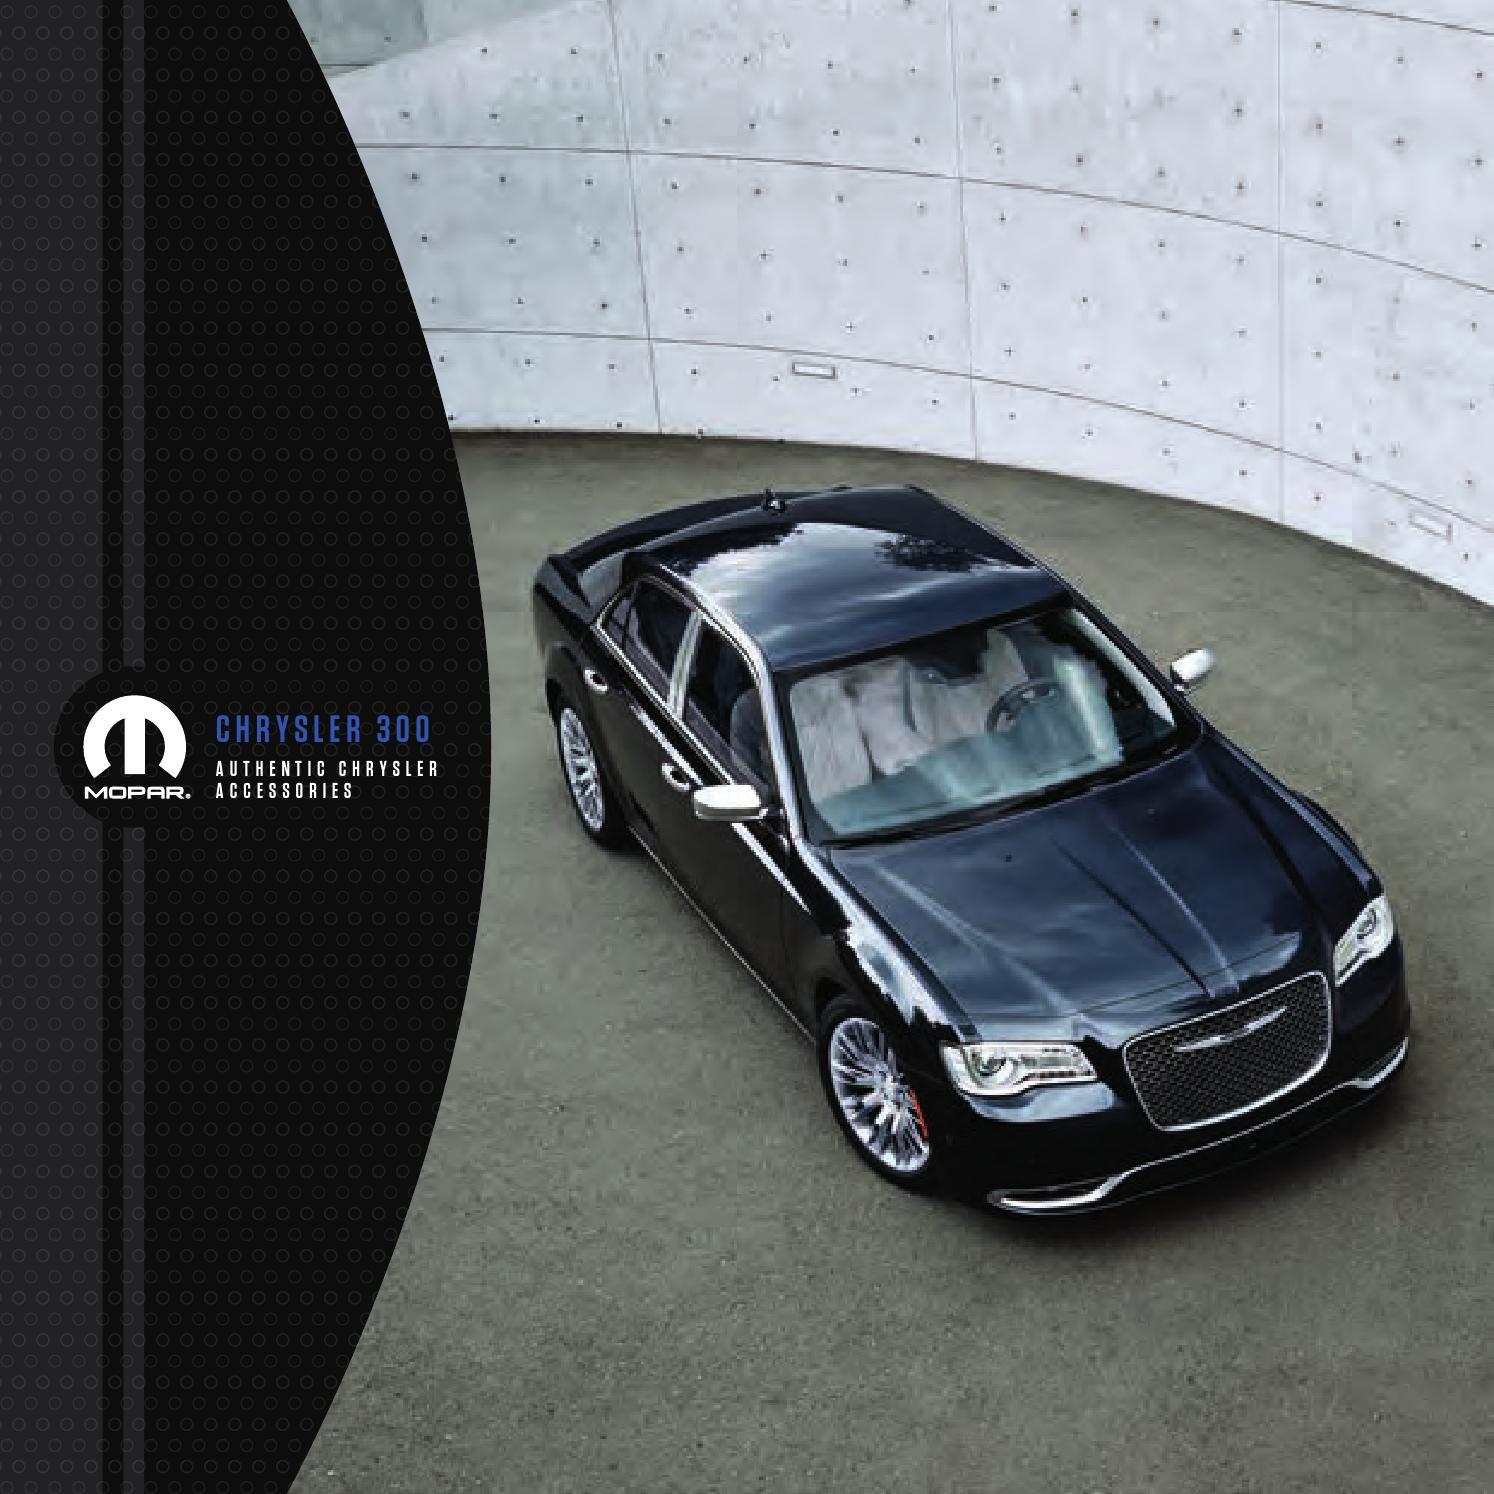 00pm4951 2015my Chrysler 300 Mopar Accessory Brochure 269